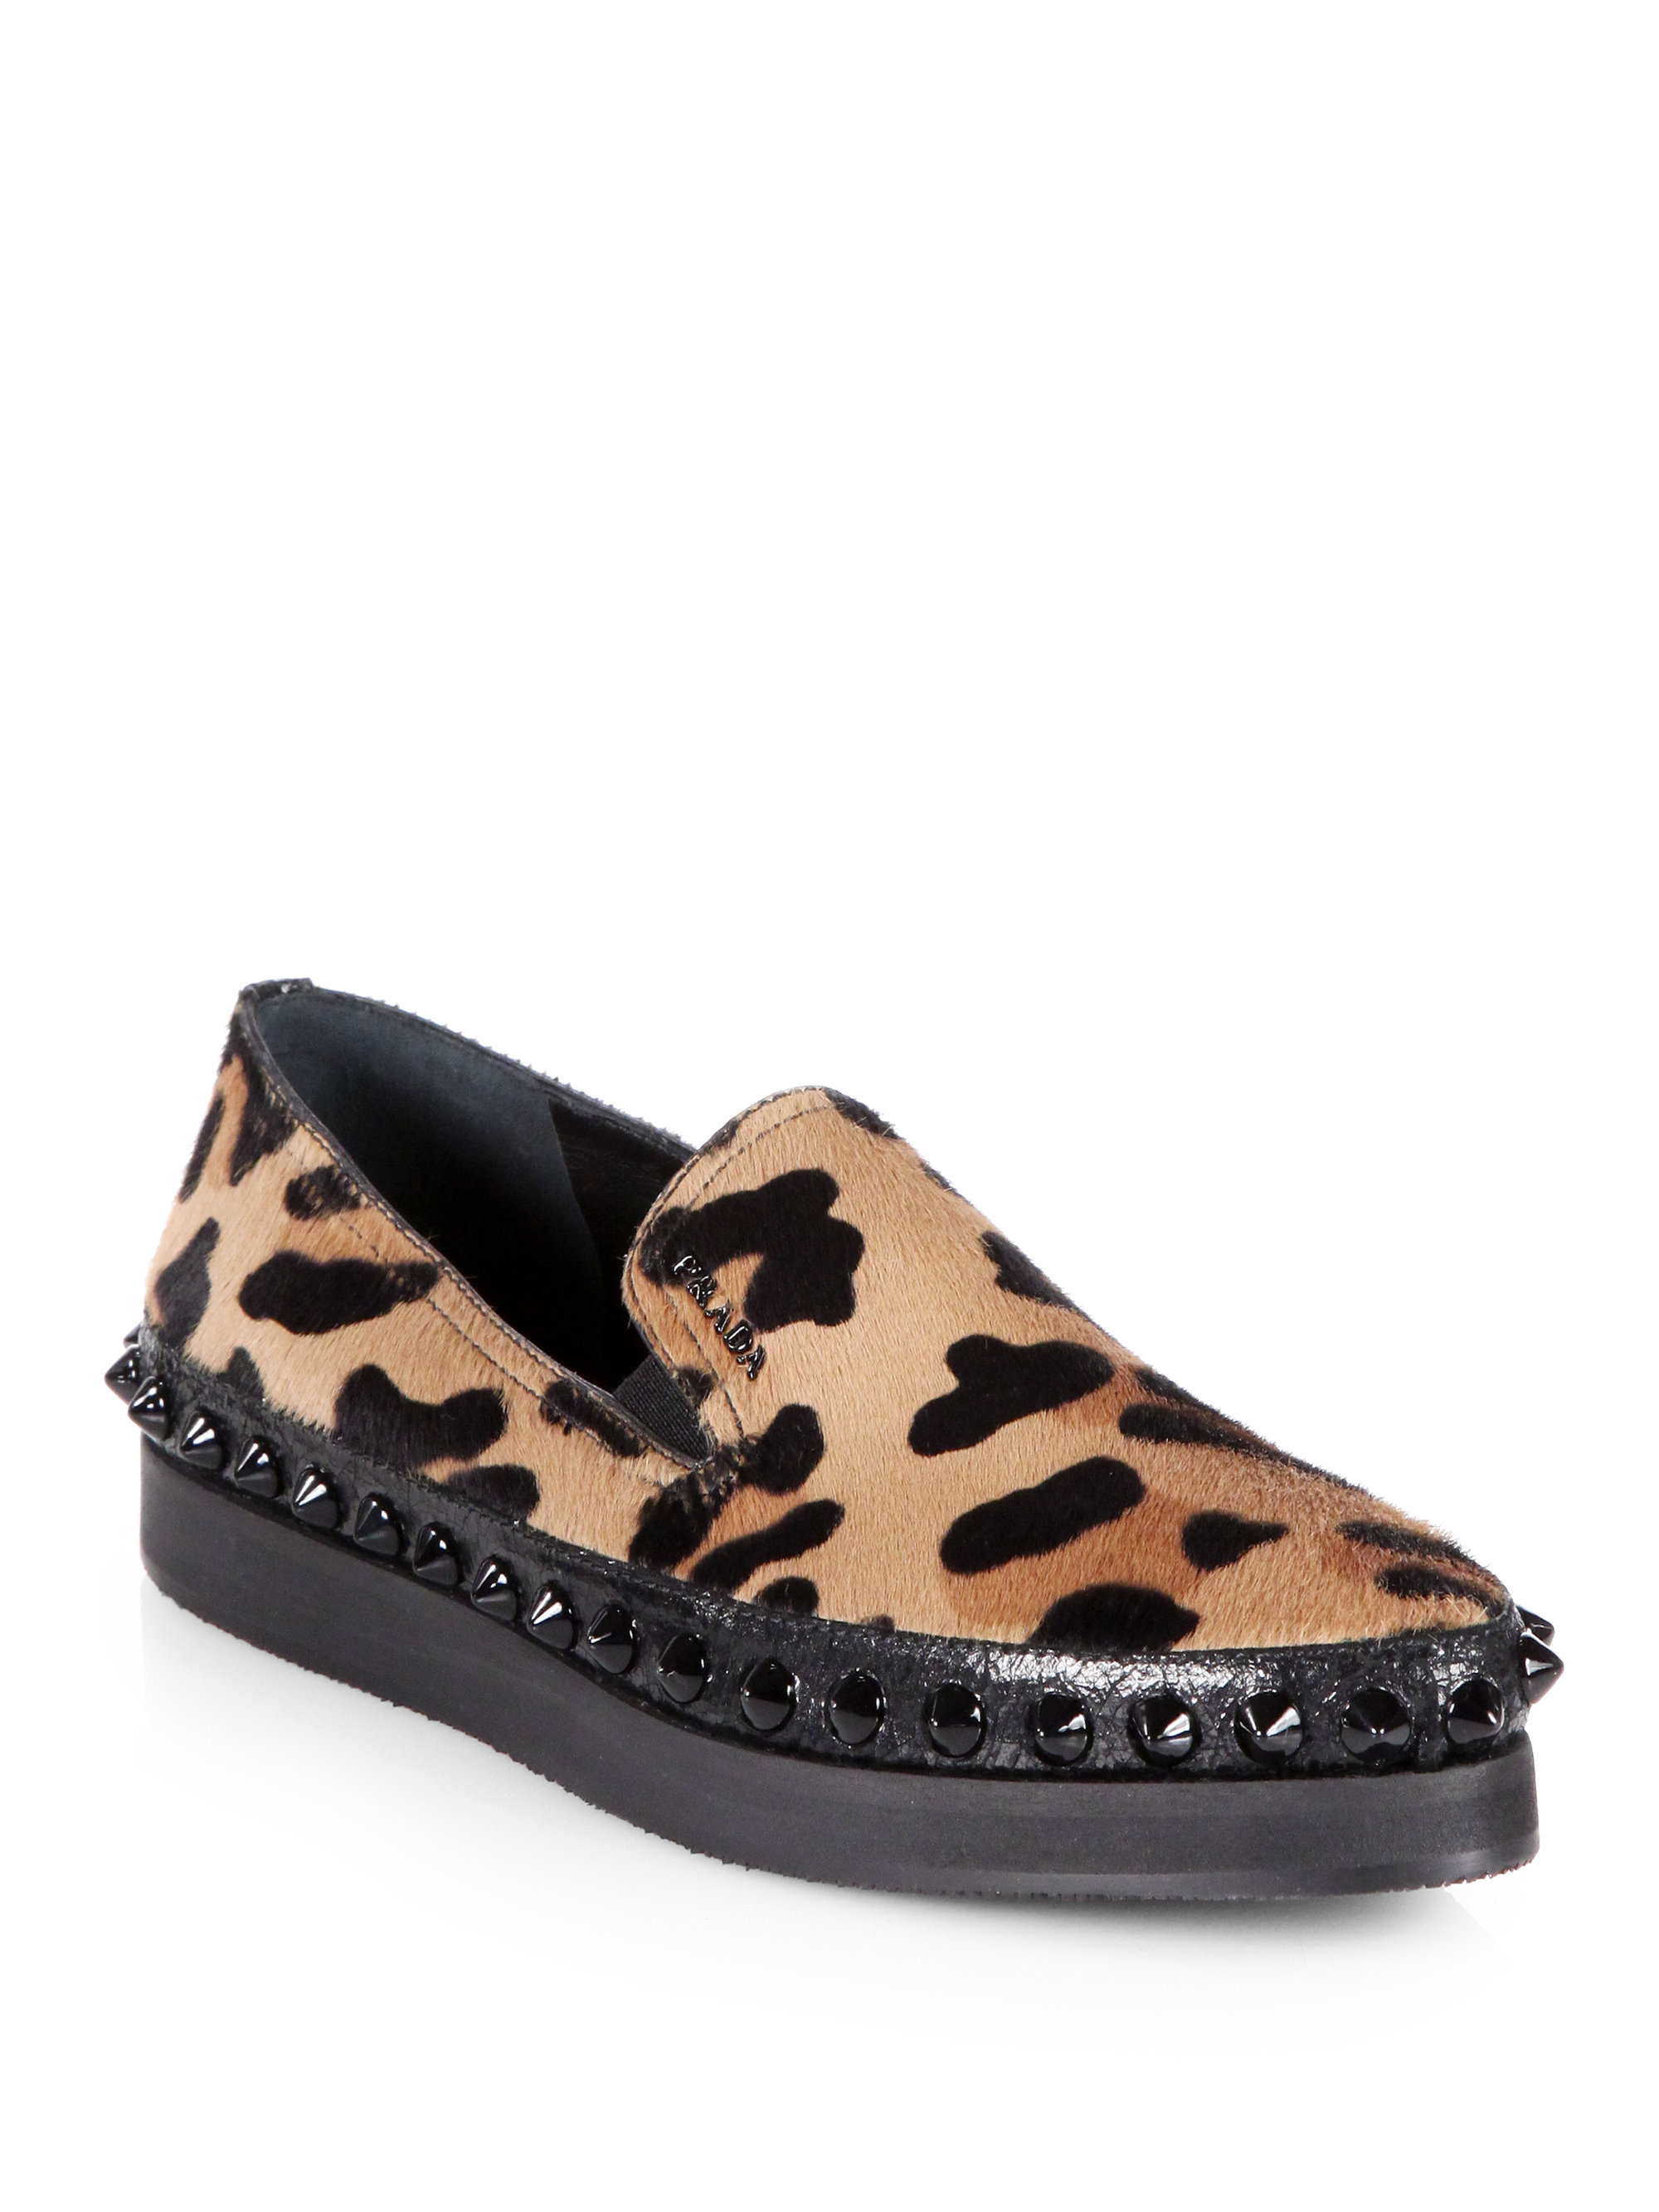 37fcbb53273 Lyst - Prada Leopardprint Calf Hair Studded Platform Loafers in Black